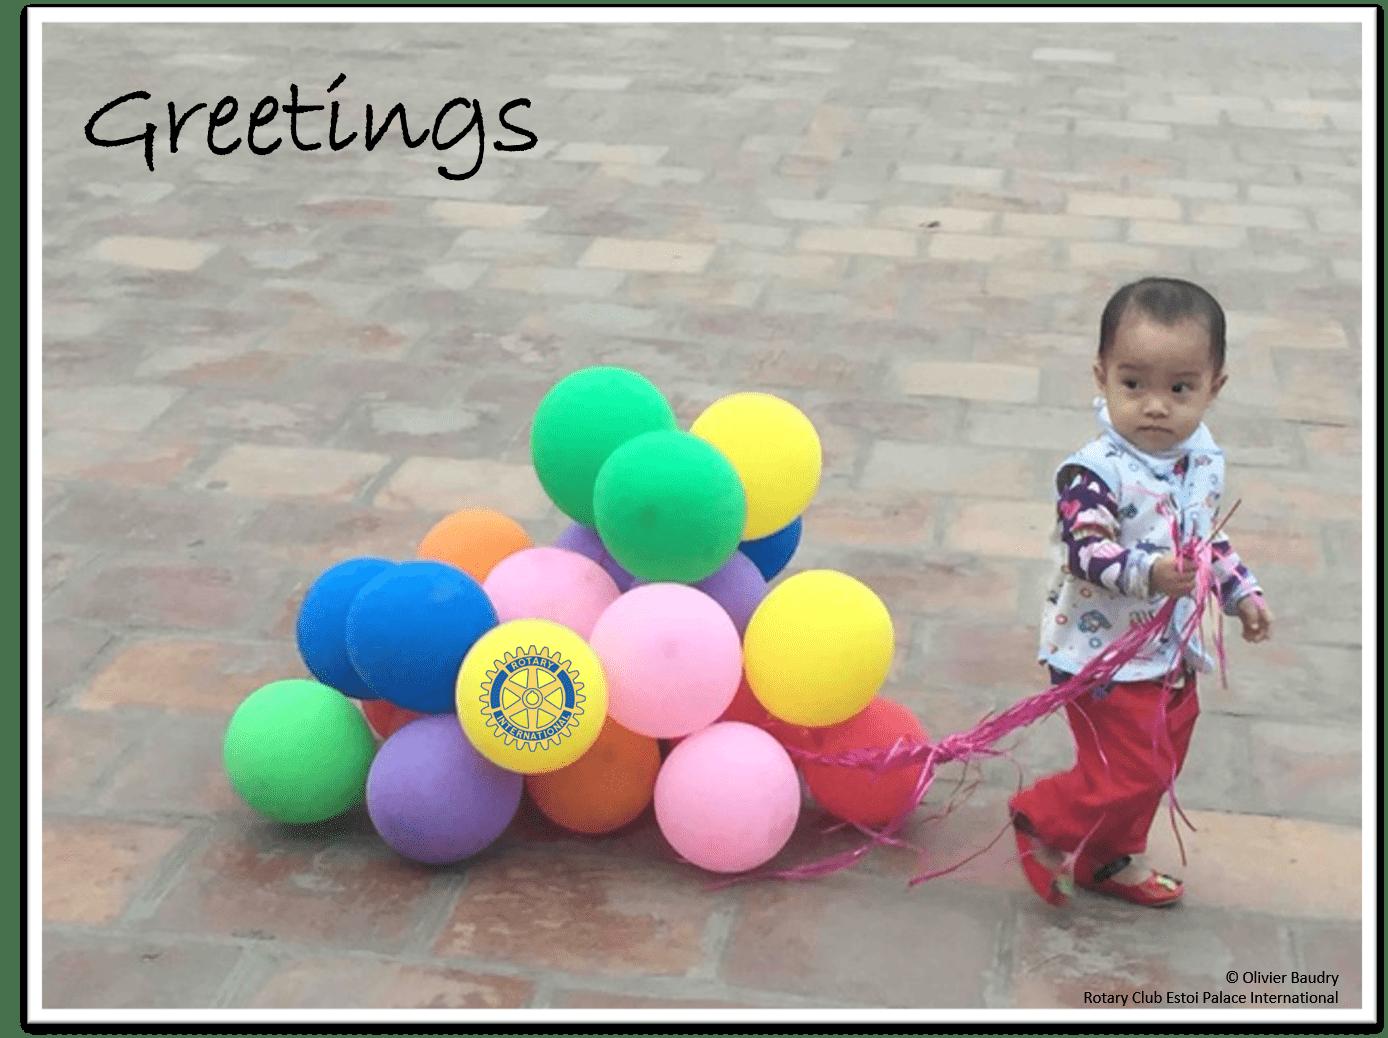 Balloons Greetings